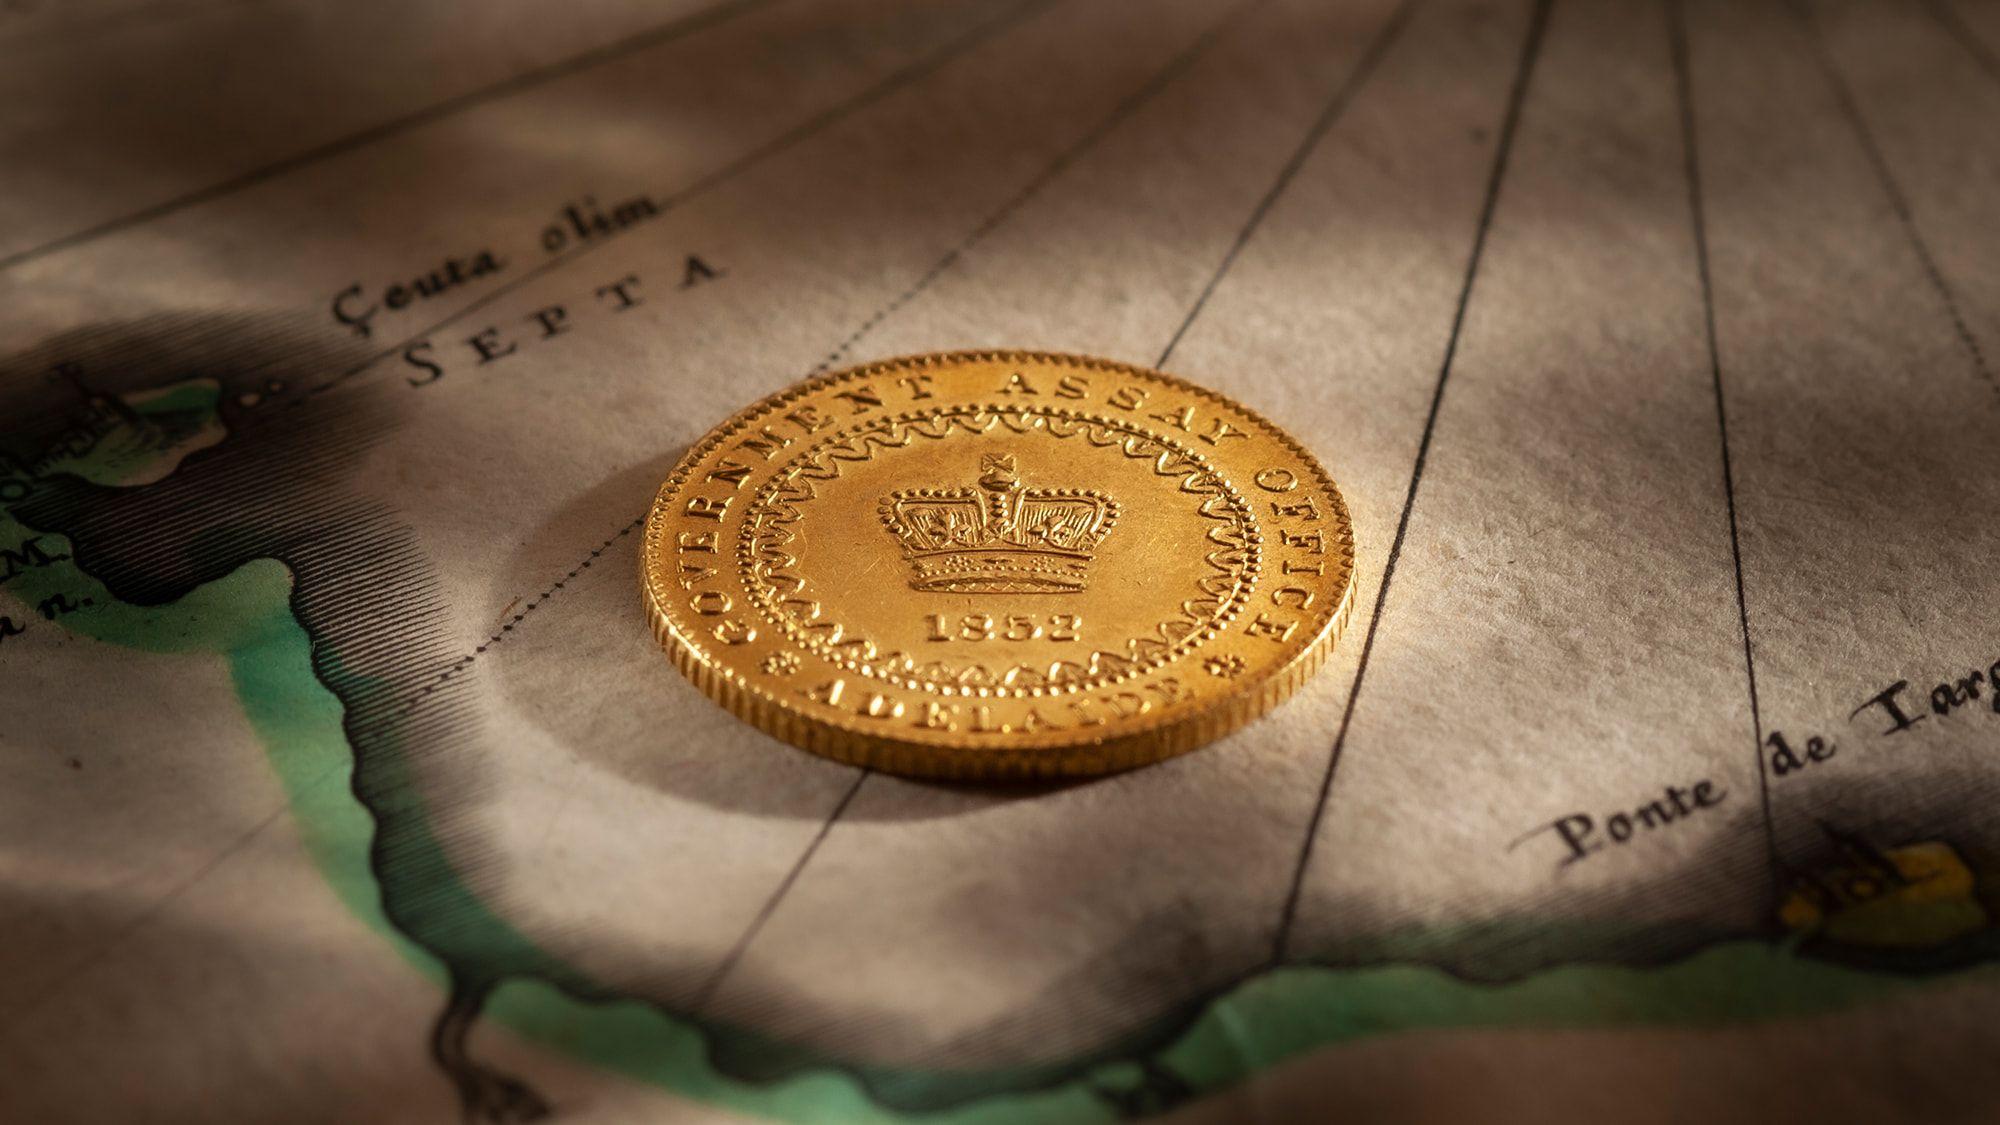 1852-Adelaide-Pound-aUnc-Rev-37393-March-2021